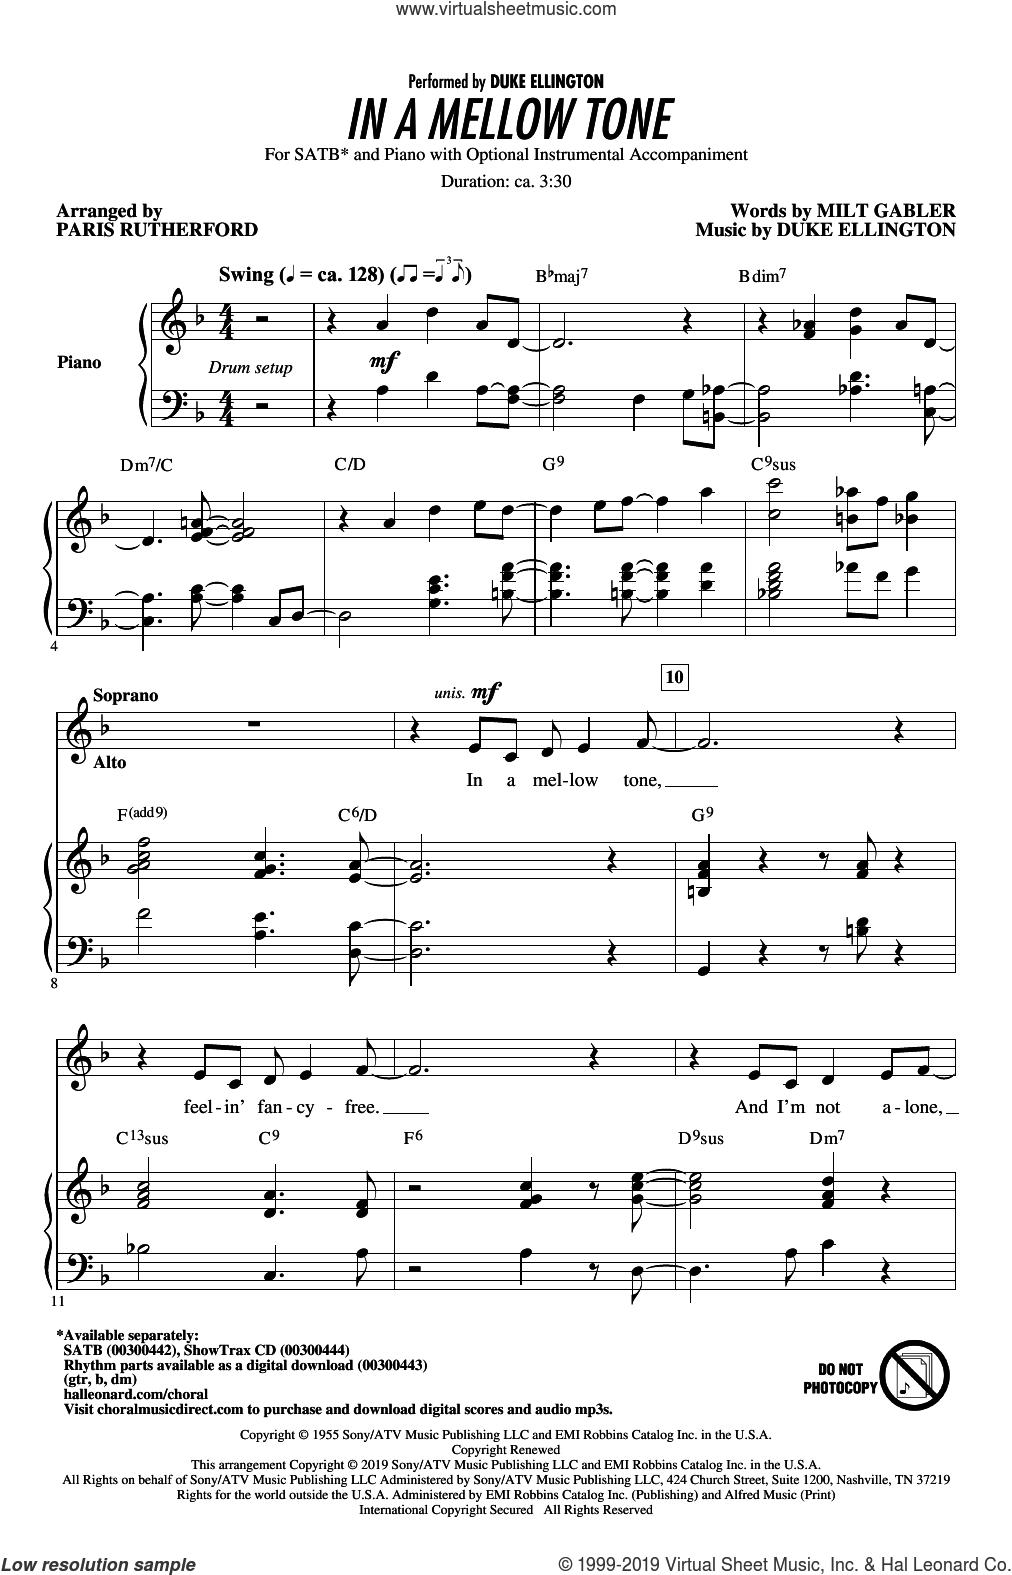 In A Mellow Tone (arr. Paris Rutherford) sheet music for choir (SATB: soprano, alto, tenor, bass) by Duke Ellington, Paris Rutherford and Milt Gabler, intermediate skill level